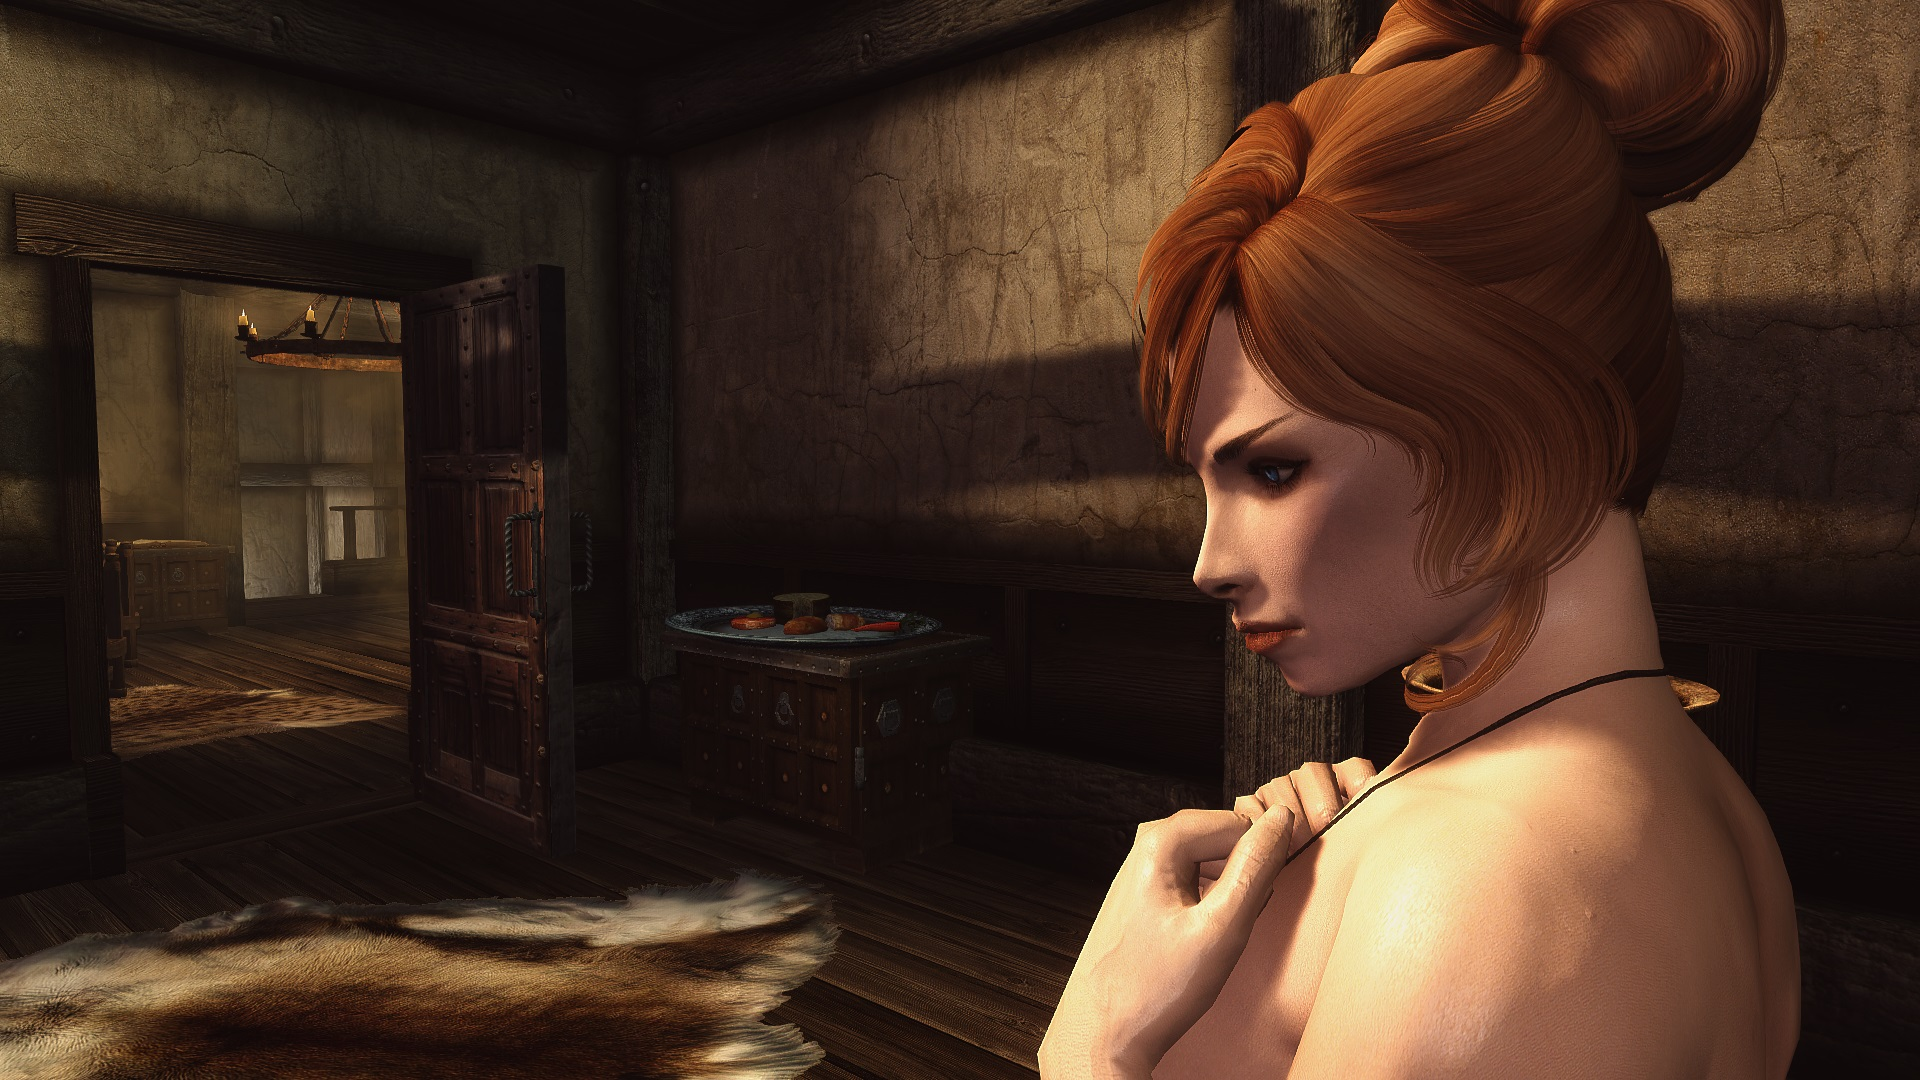 Fotos - Elder Scrolls 5: Skyrim, the